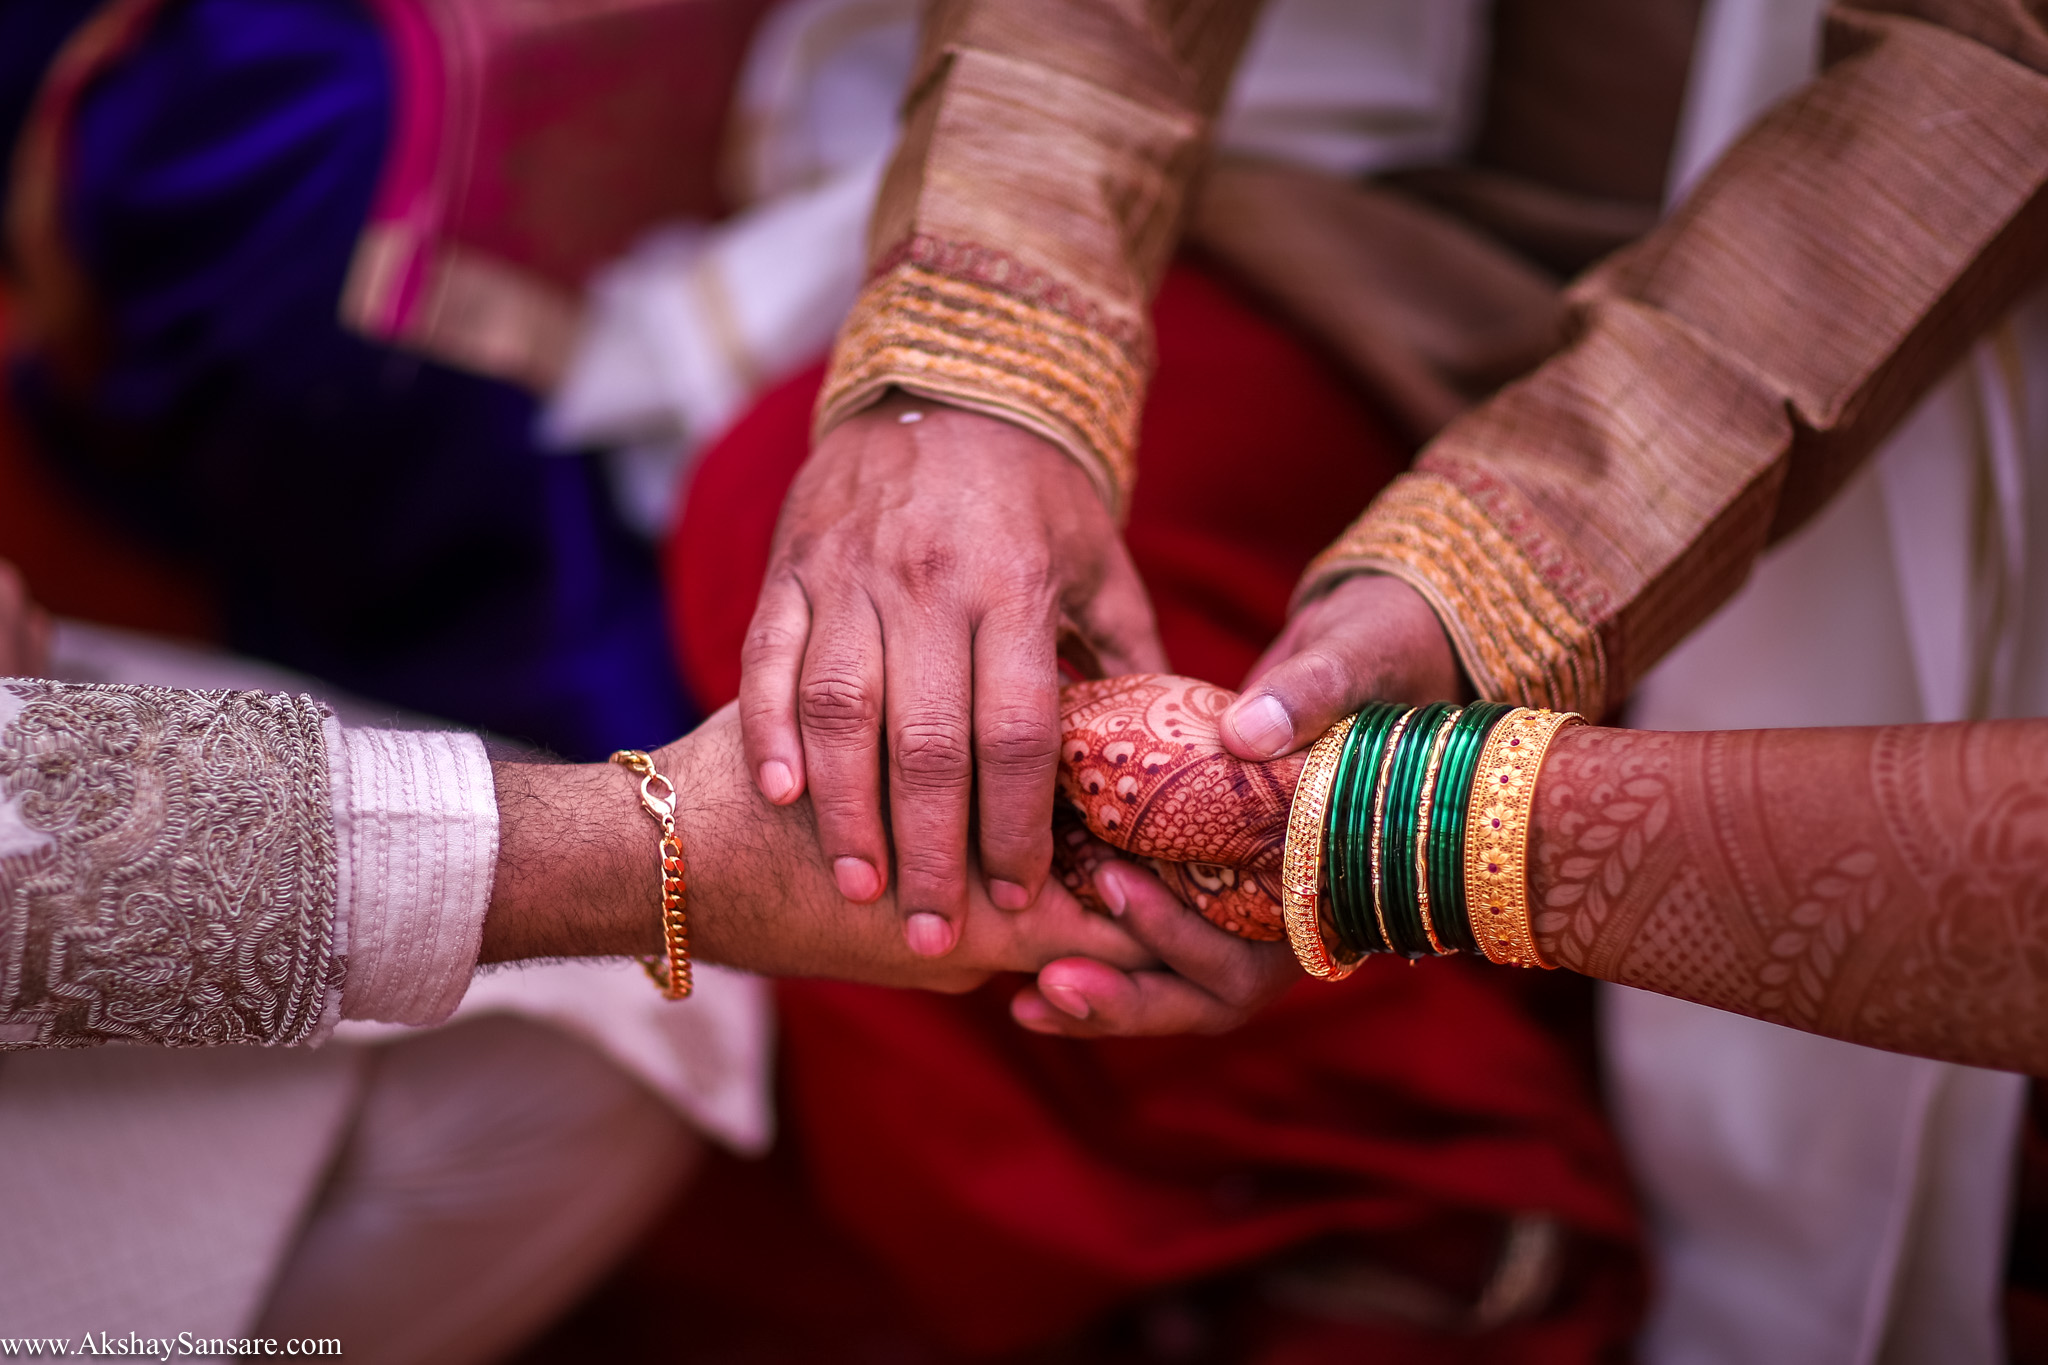 Salil x Kimaya Akshay Sansare Photography Candid wedding Photographer in mumbai best(21).jpg